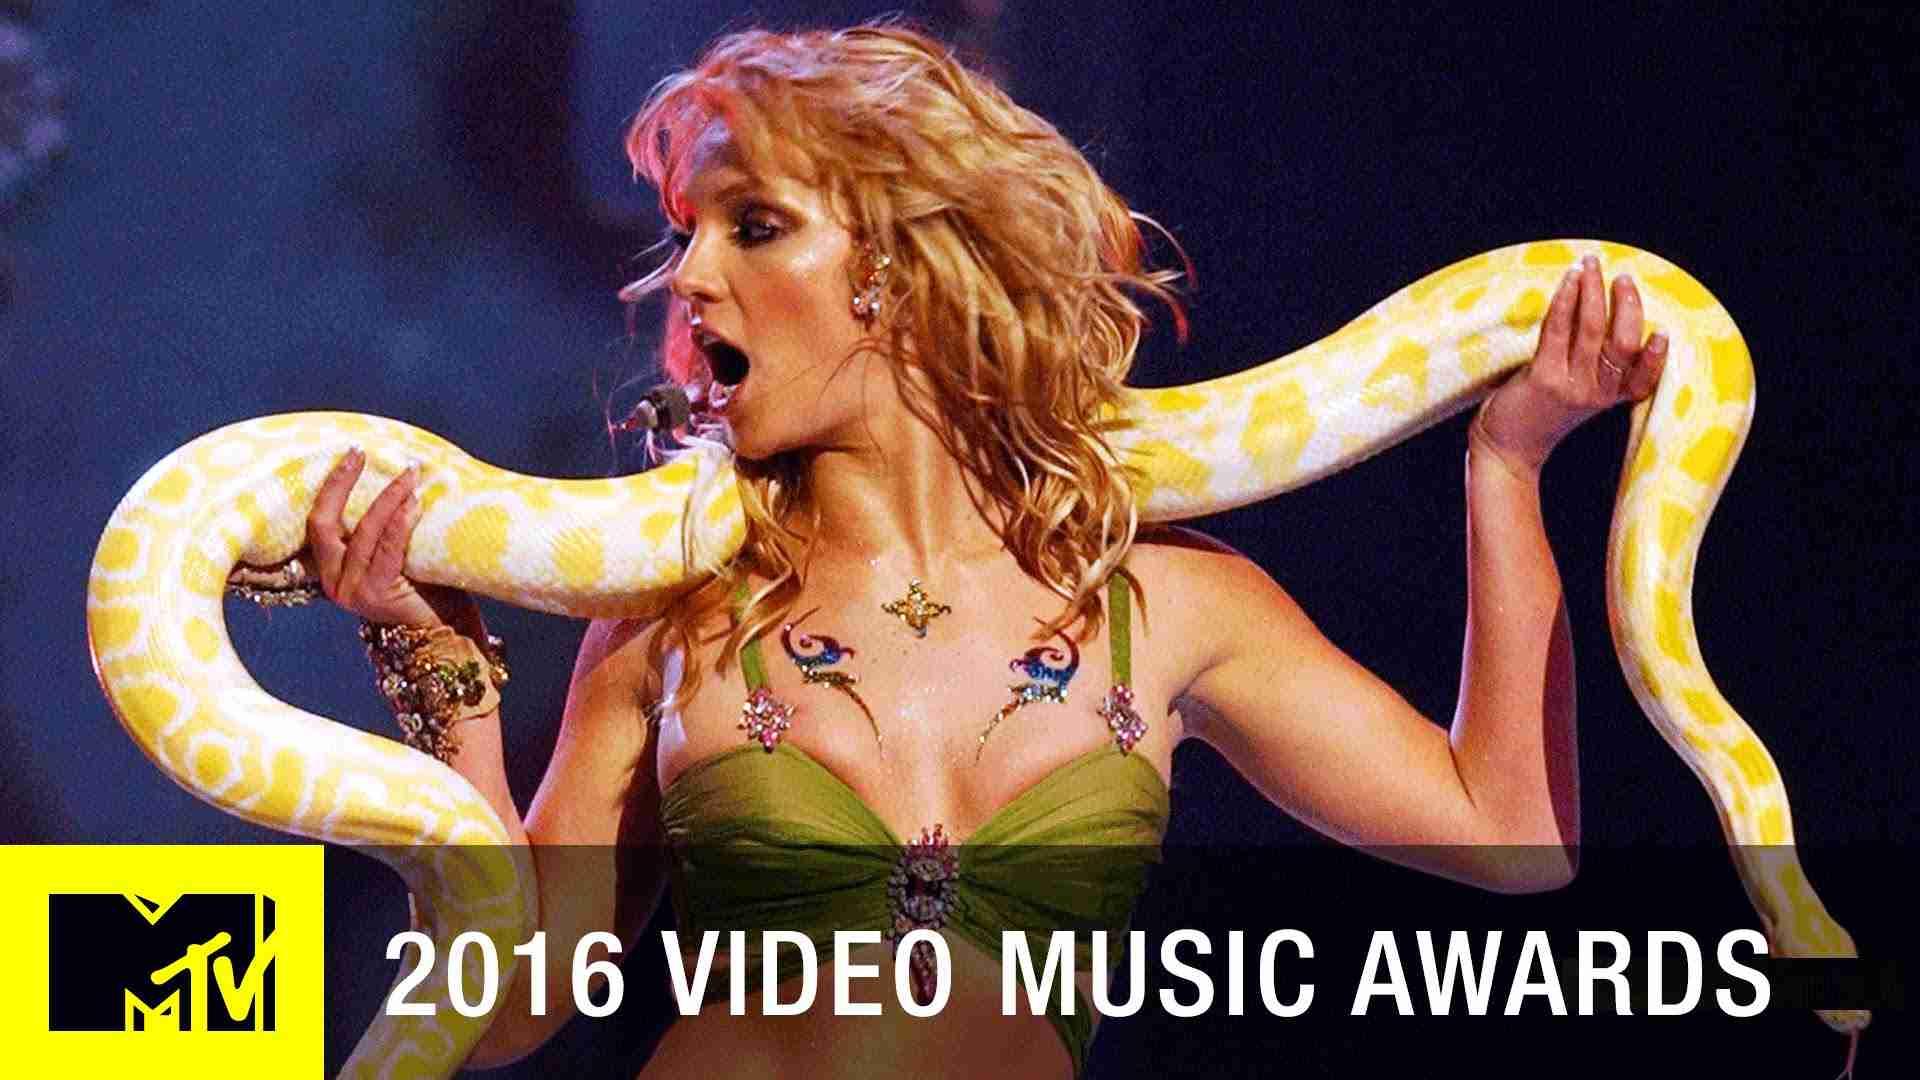 Britney Spears 'I'm a Slave 4 U' 2001 VMA Performance | MTV - YouTube